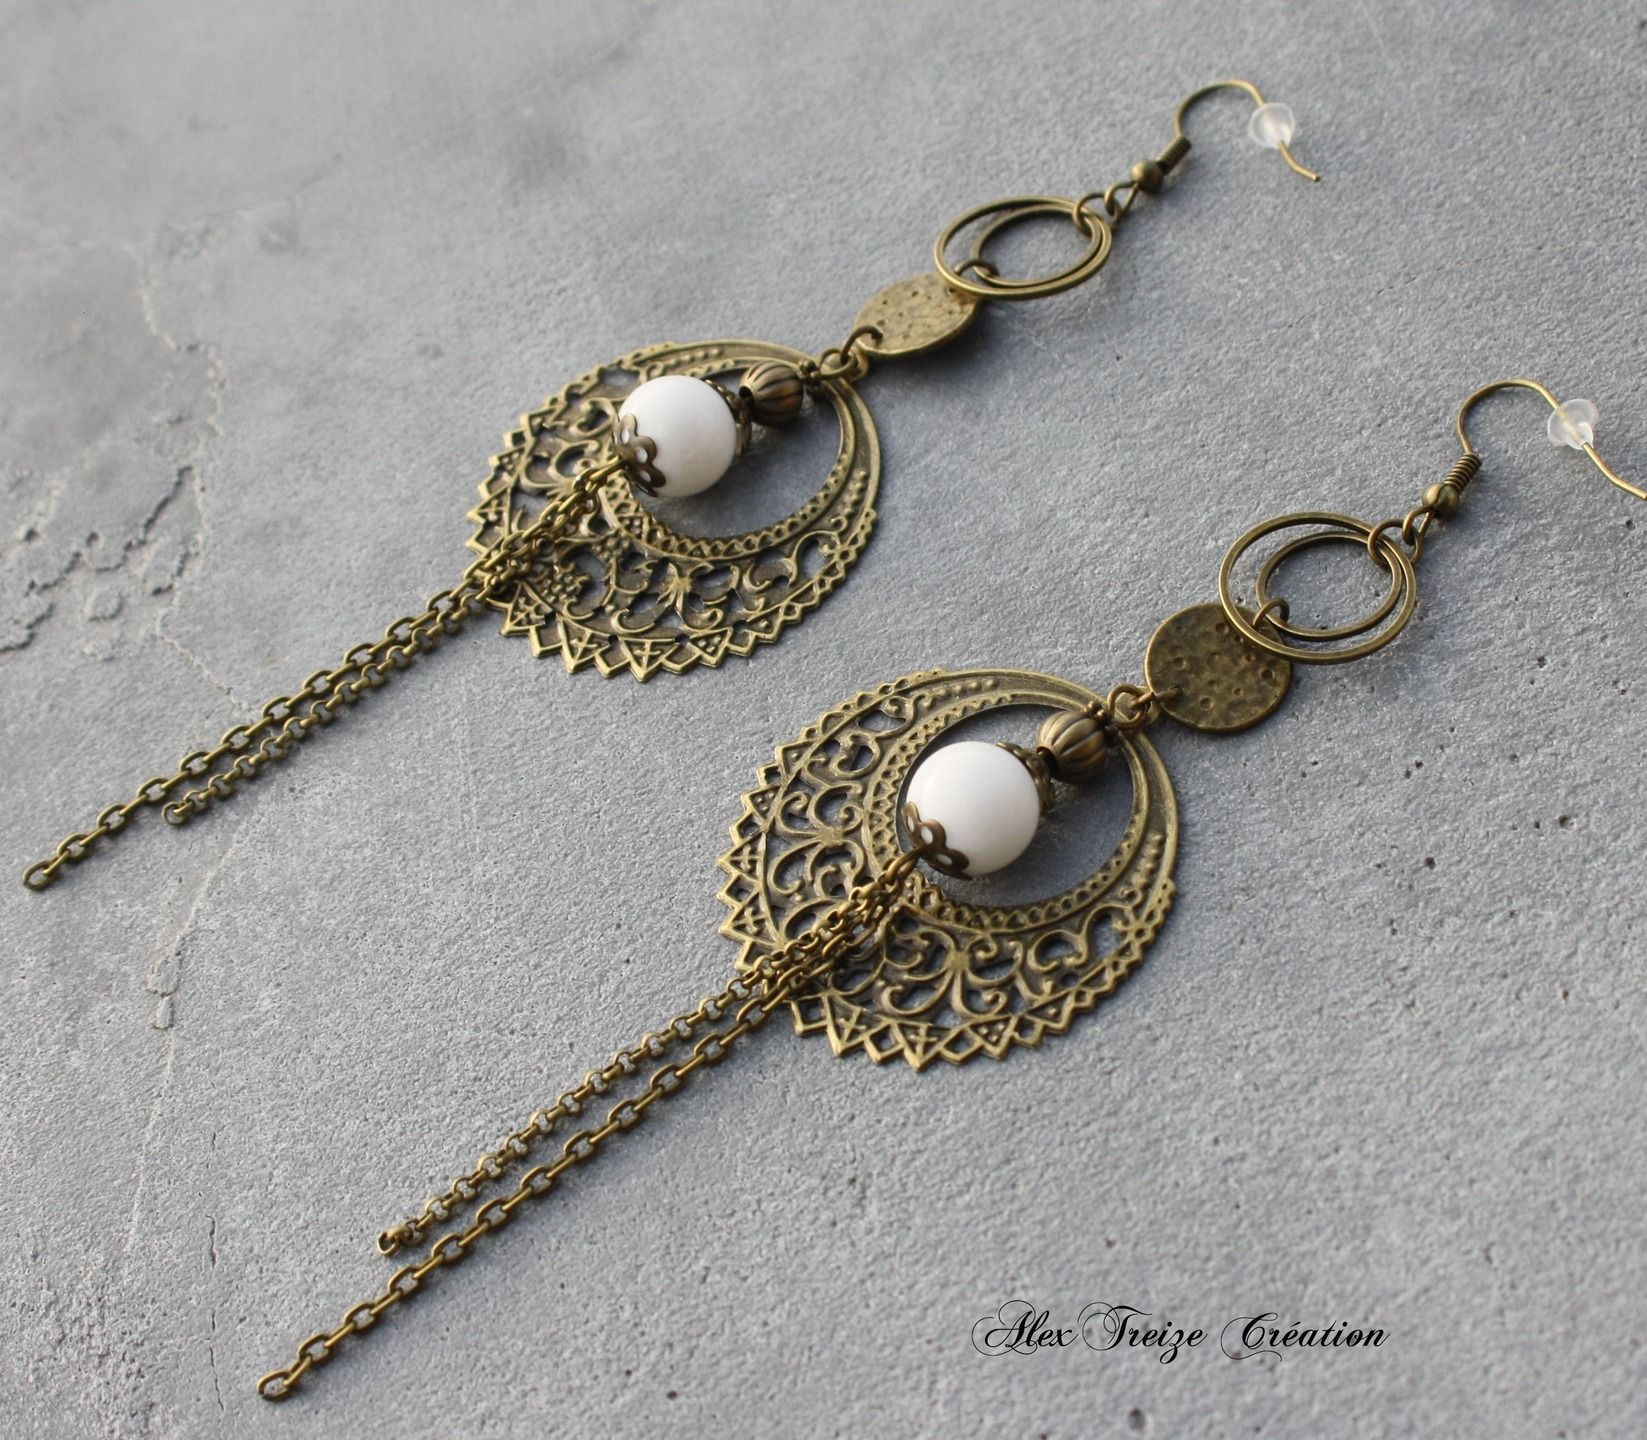 bijou cr ateur boucles d 39 oreilles pendantes bronze breloques estampes rondes filigran es. Black Bedroom Furniture Sets. Home Design Ideas